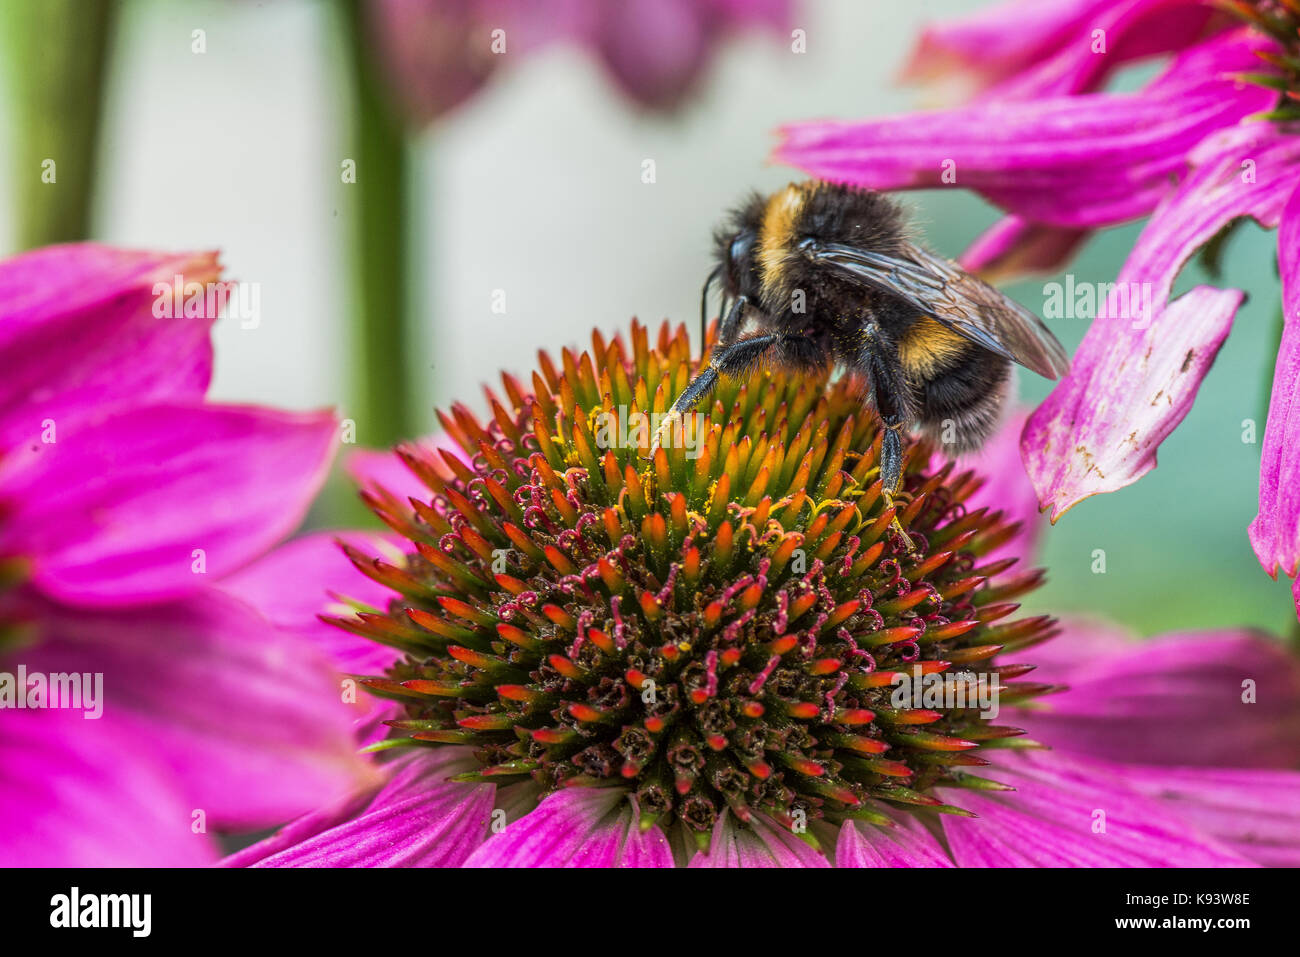 insects on Echinacea blossom, Hamburg, Germany - Stock Image